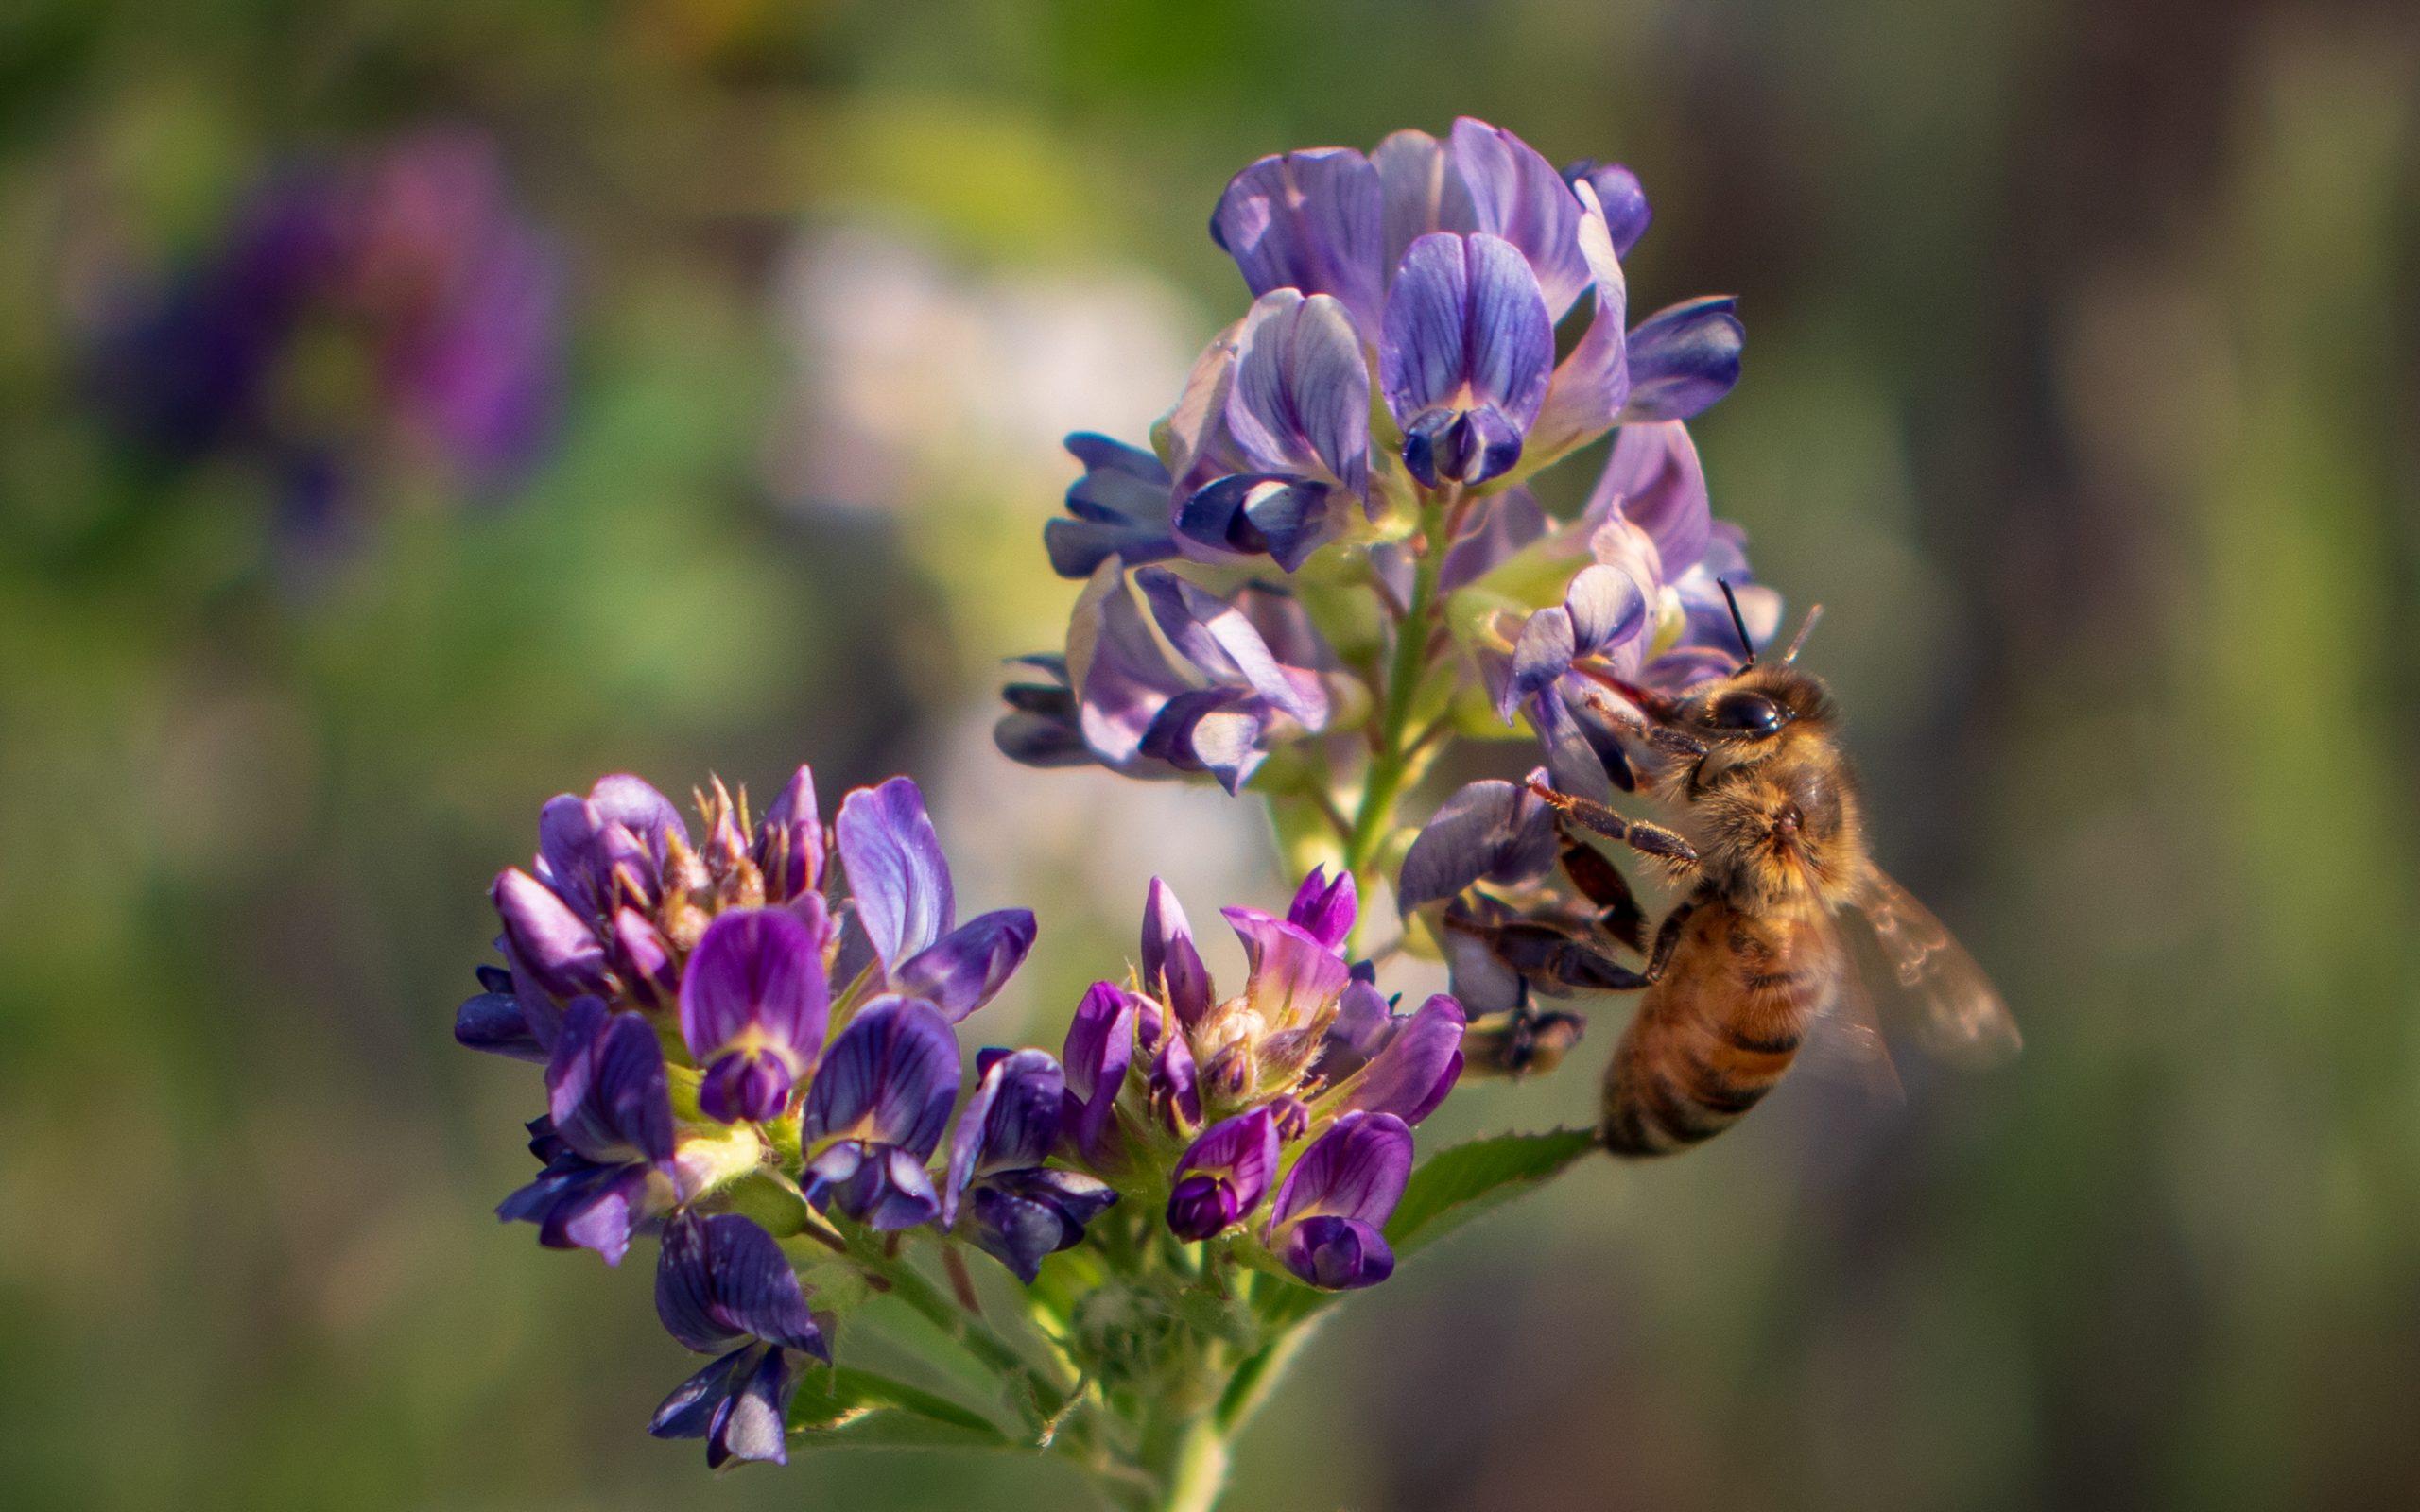 Honey Bee Extracting Alfalfa Nectar